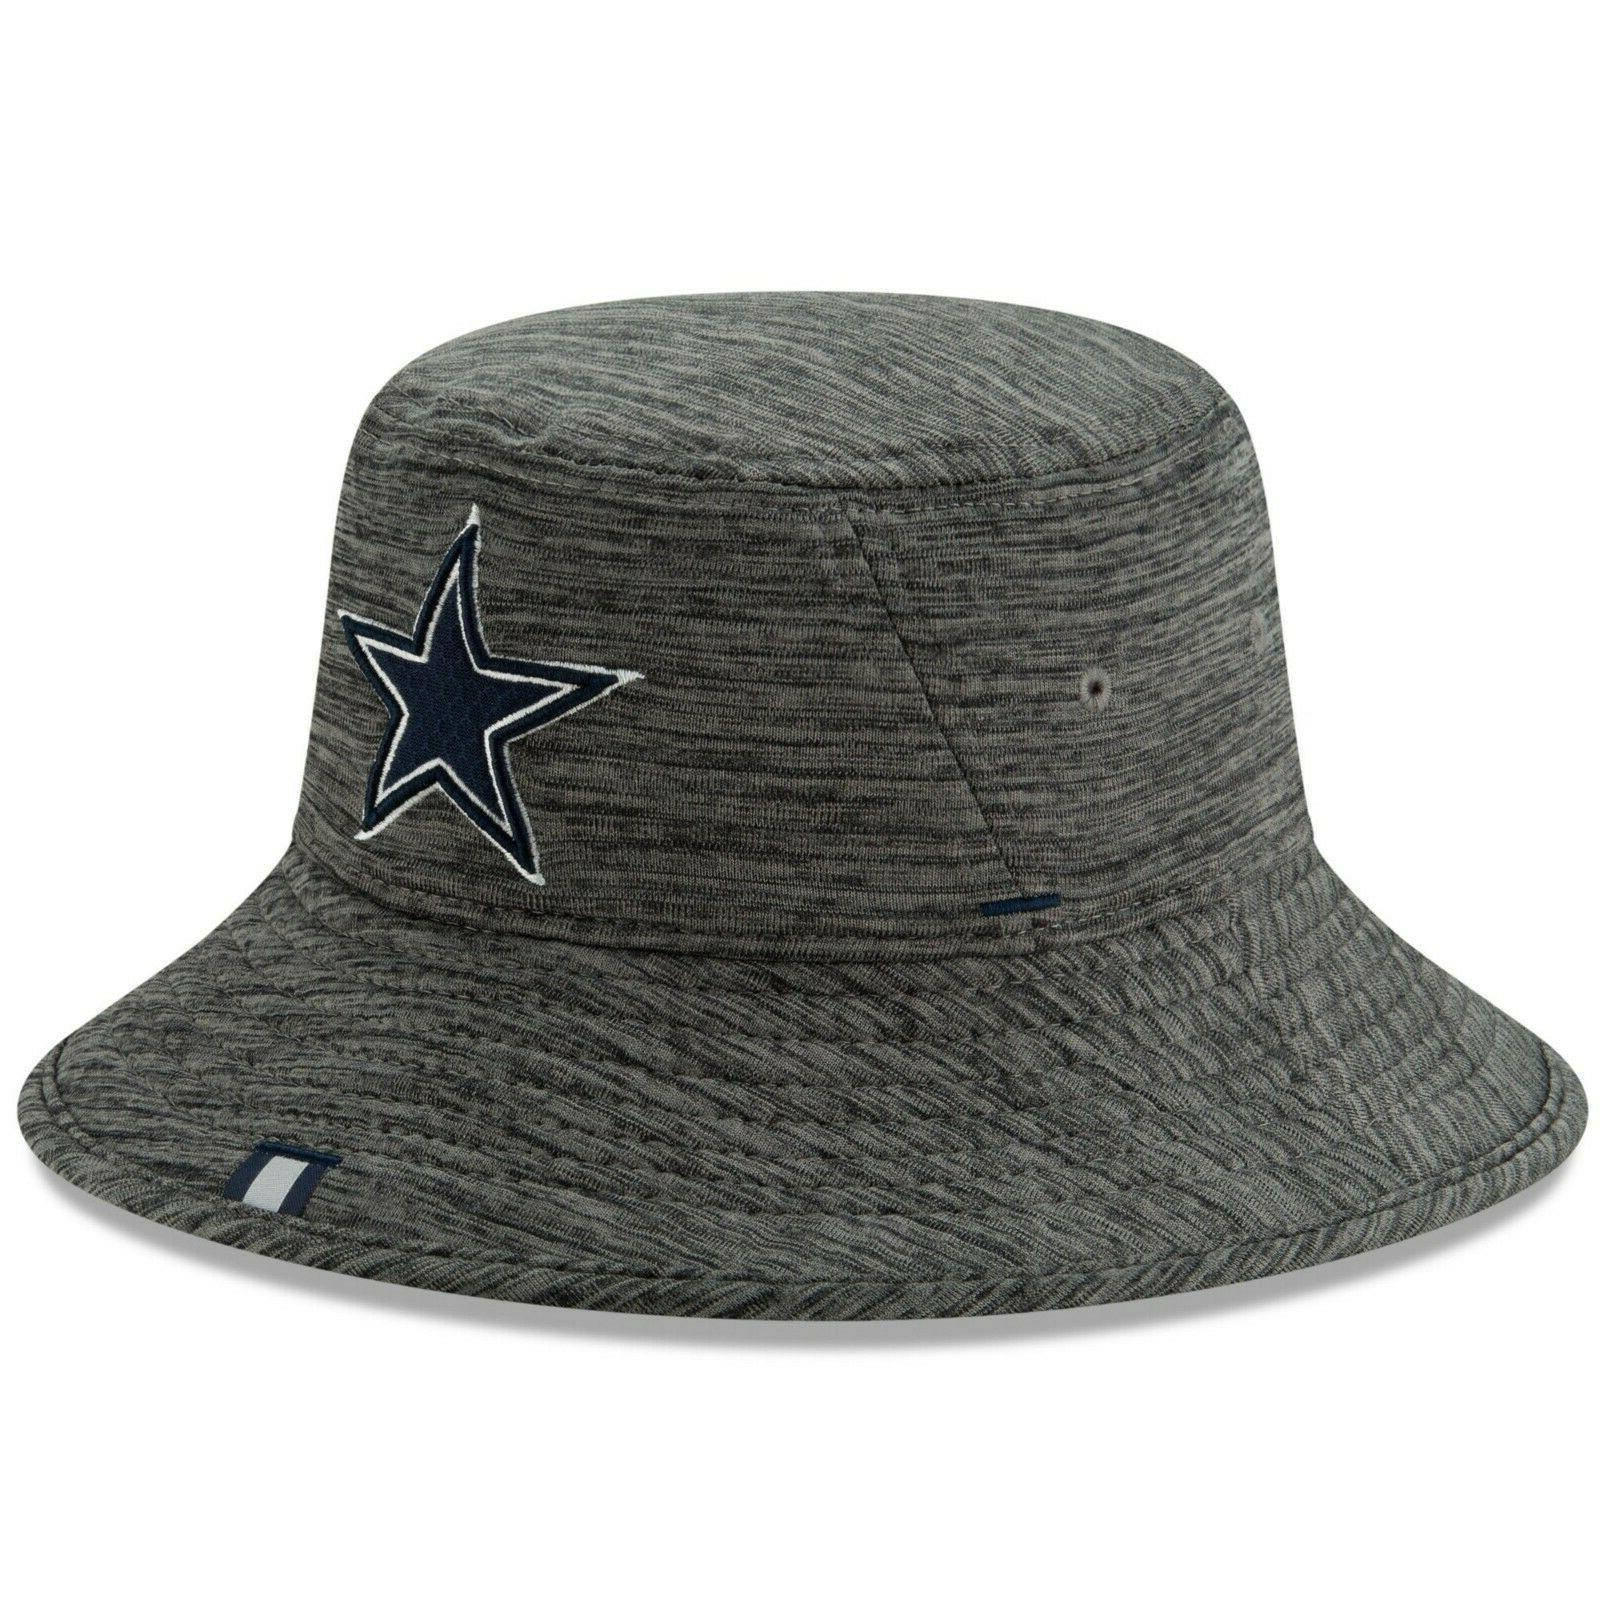 Dallas Cowboys New Graphite Bucket Hat - 2019 Free - OSFM